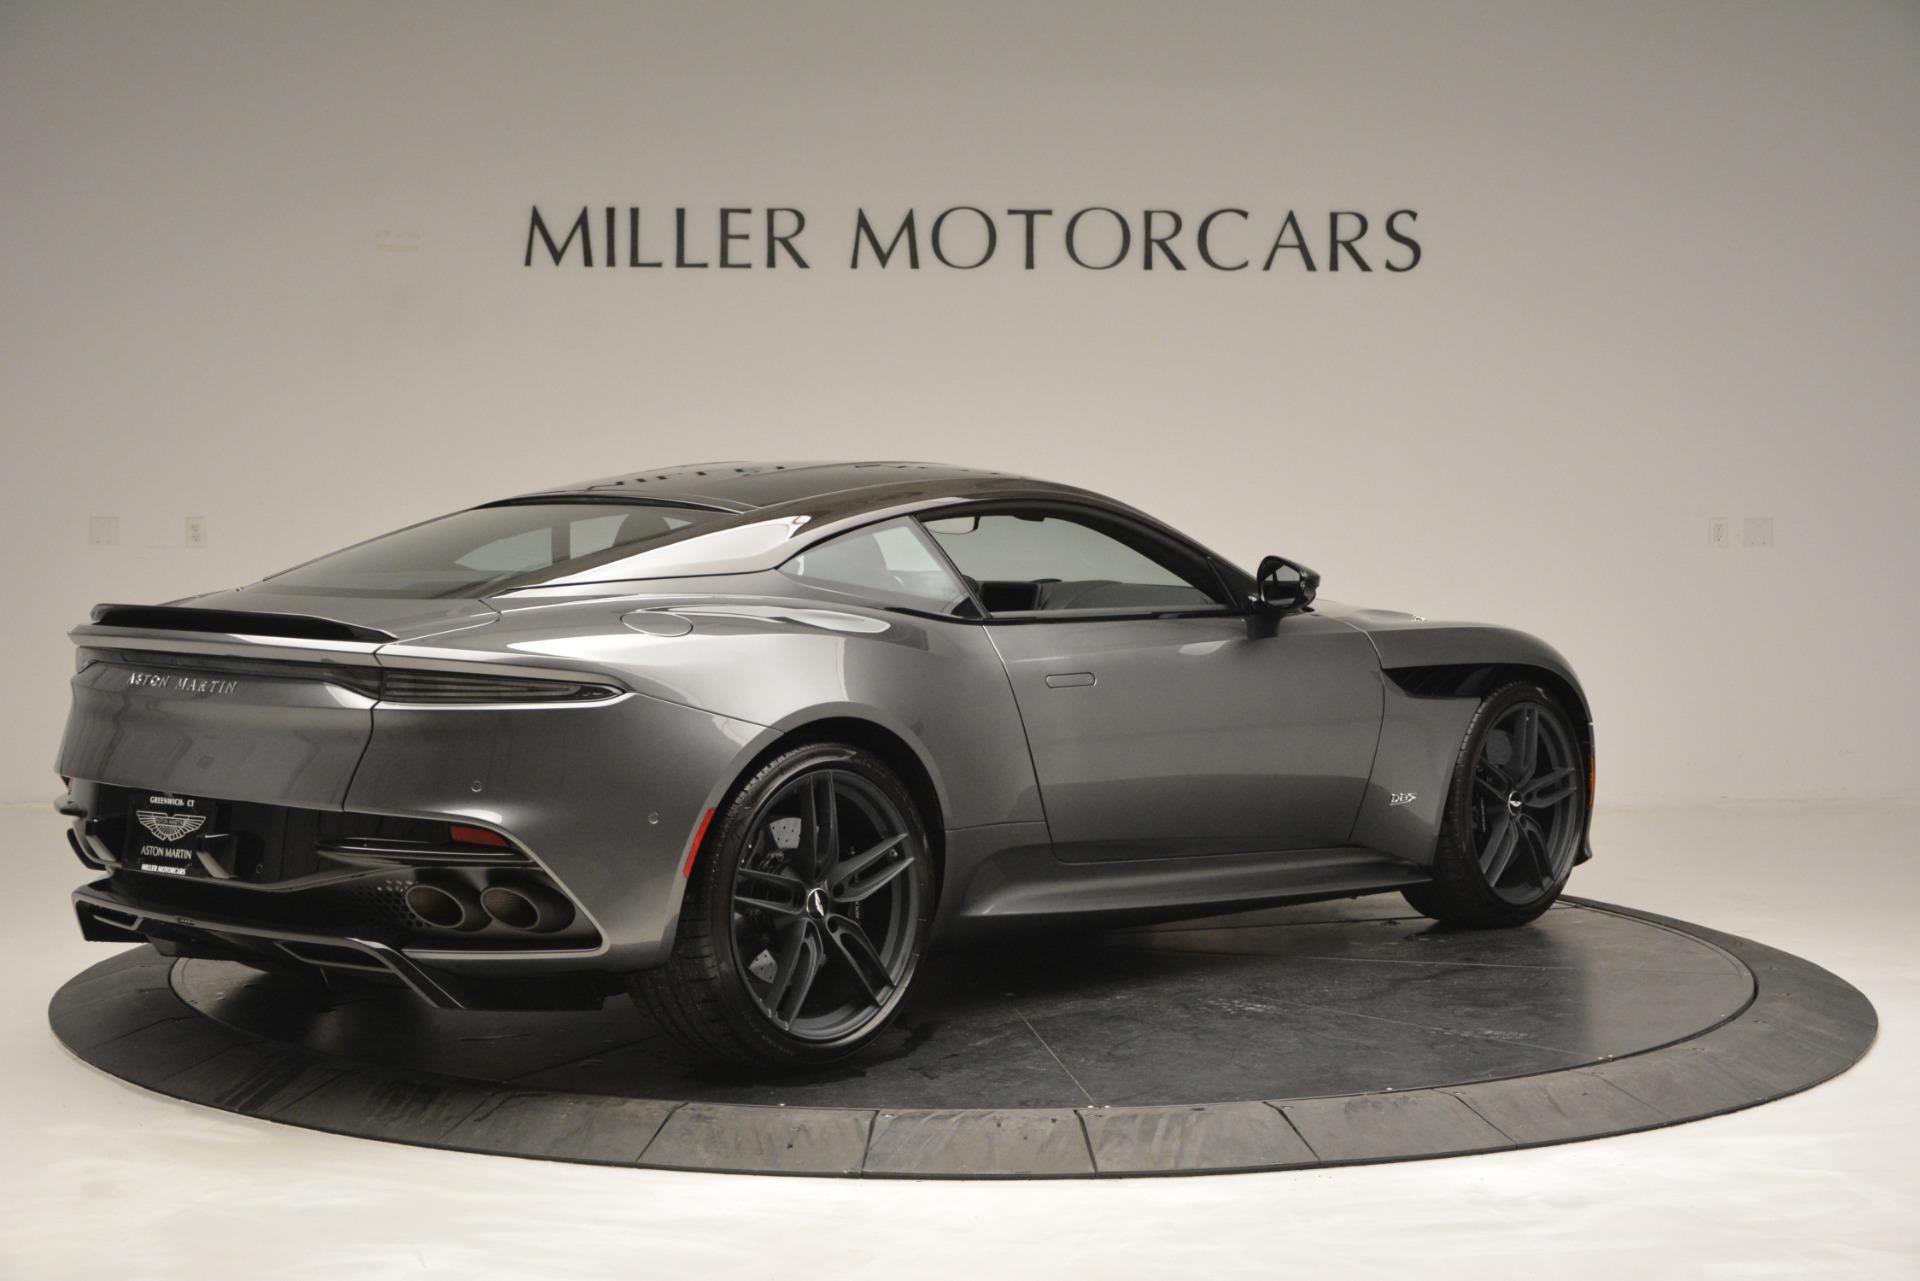 Used 2019 Aston Martin DBS Superleggera For Sale In Greenwich, CT 2917_p8